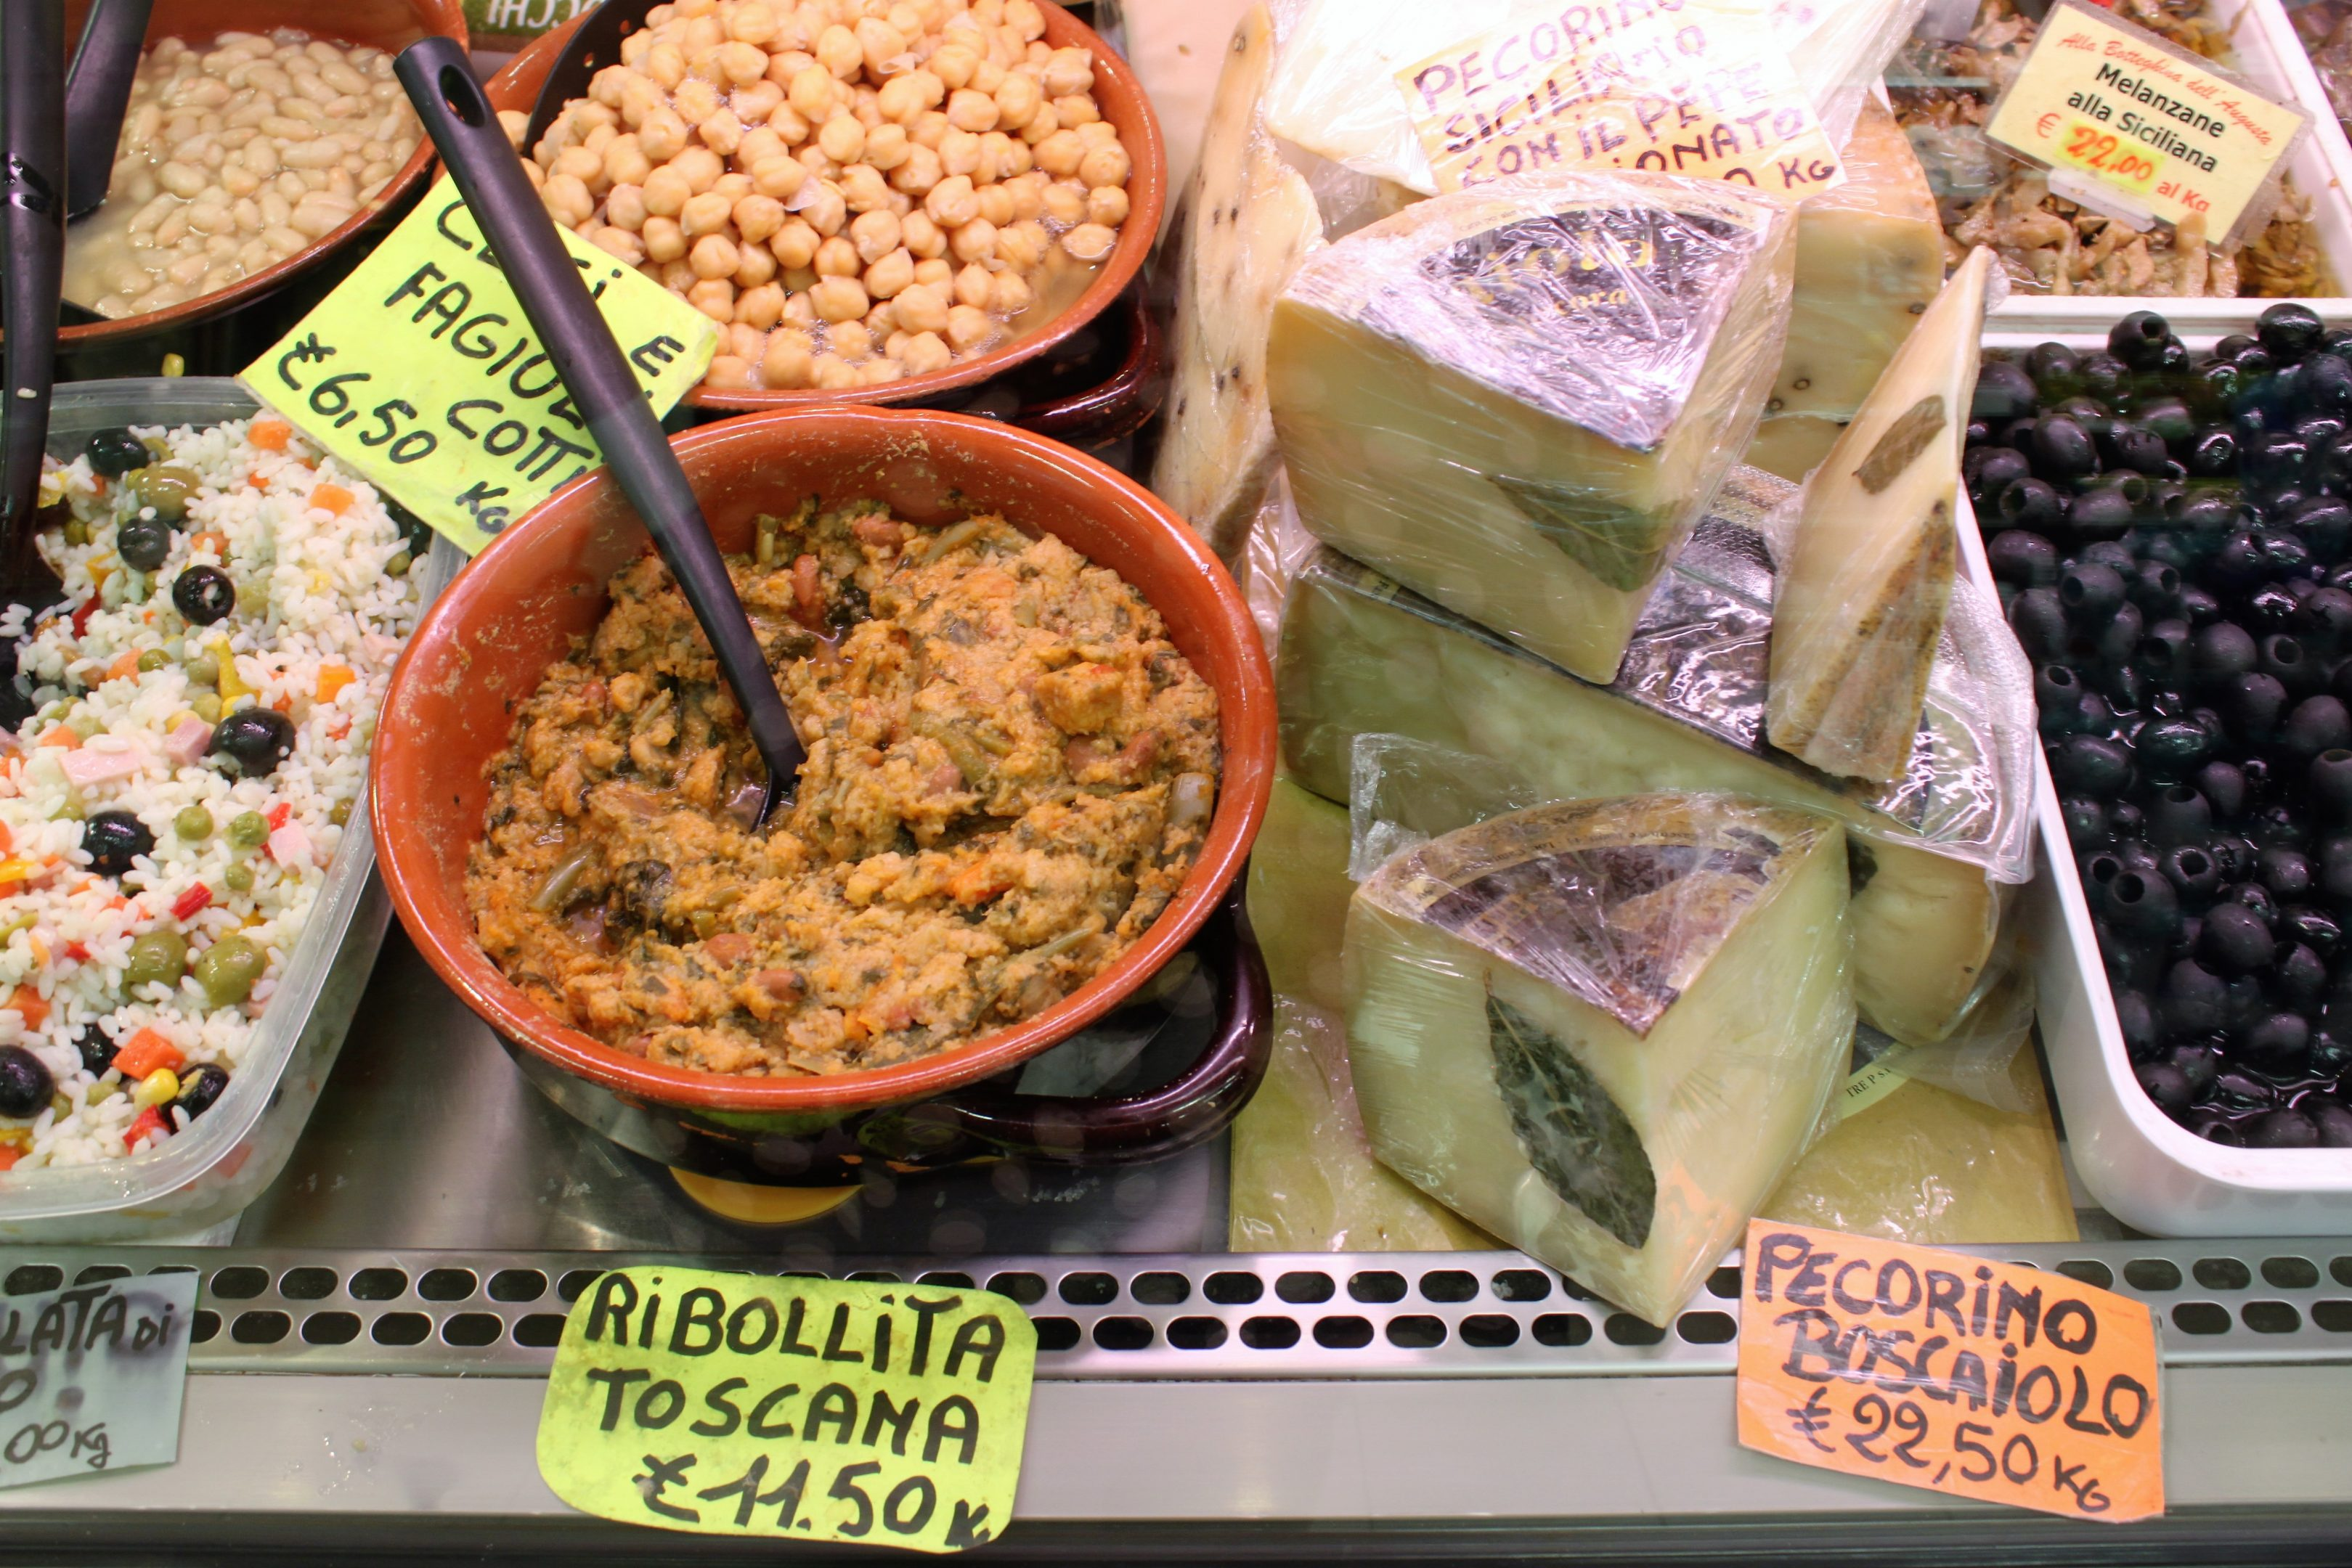 ribollita toscana sant'ambrogio market Florence